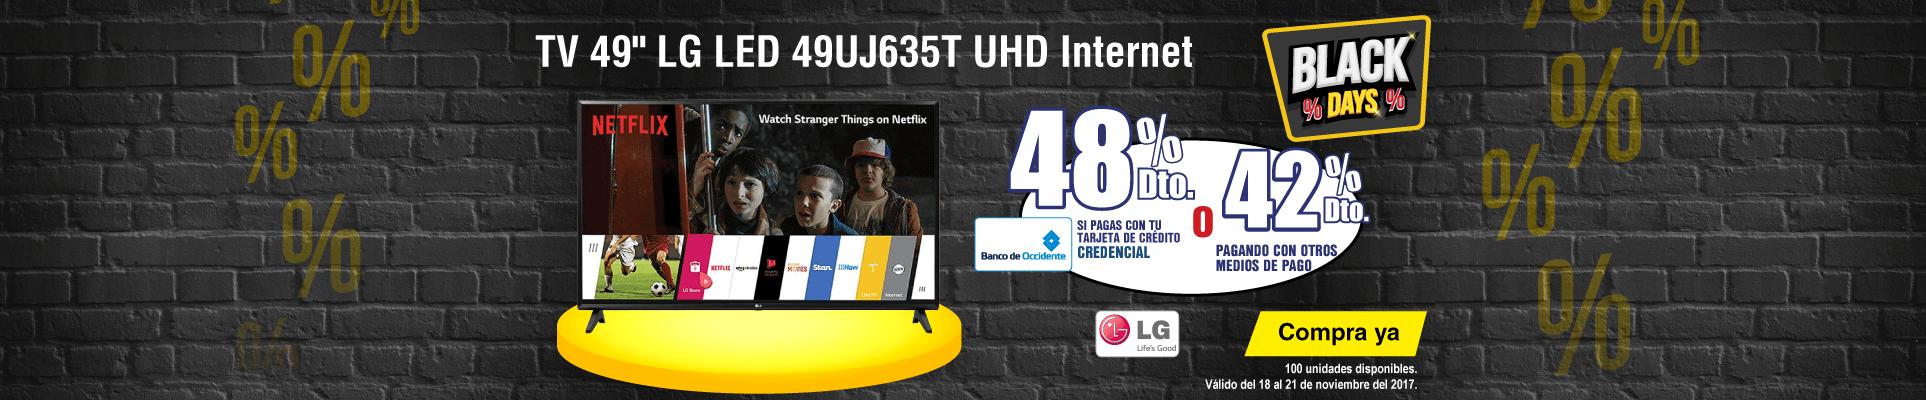 PPAL ALKP-3-tv-TV 49 123cm LG LED 49UJ635T UHD Internet-prod-septiembre18-21-MARCAS